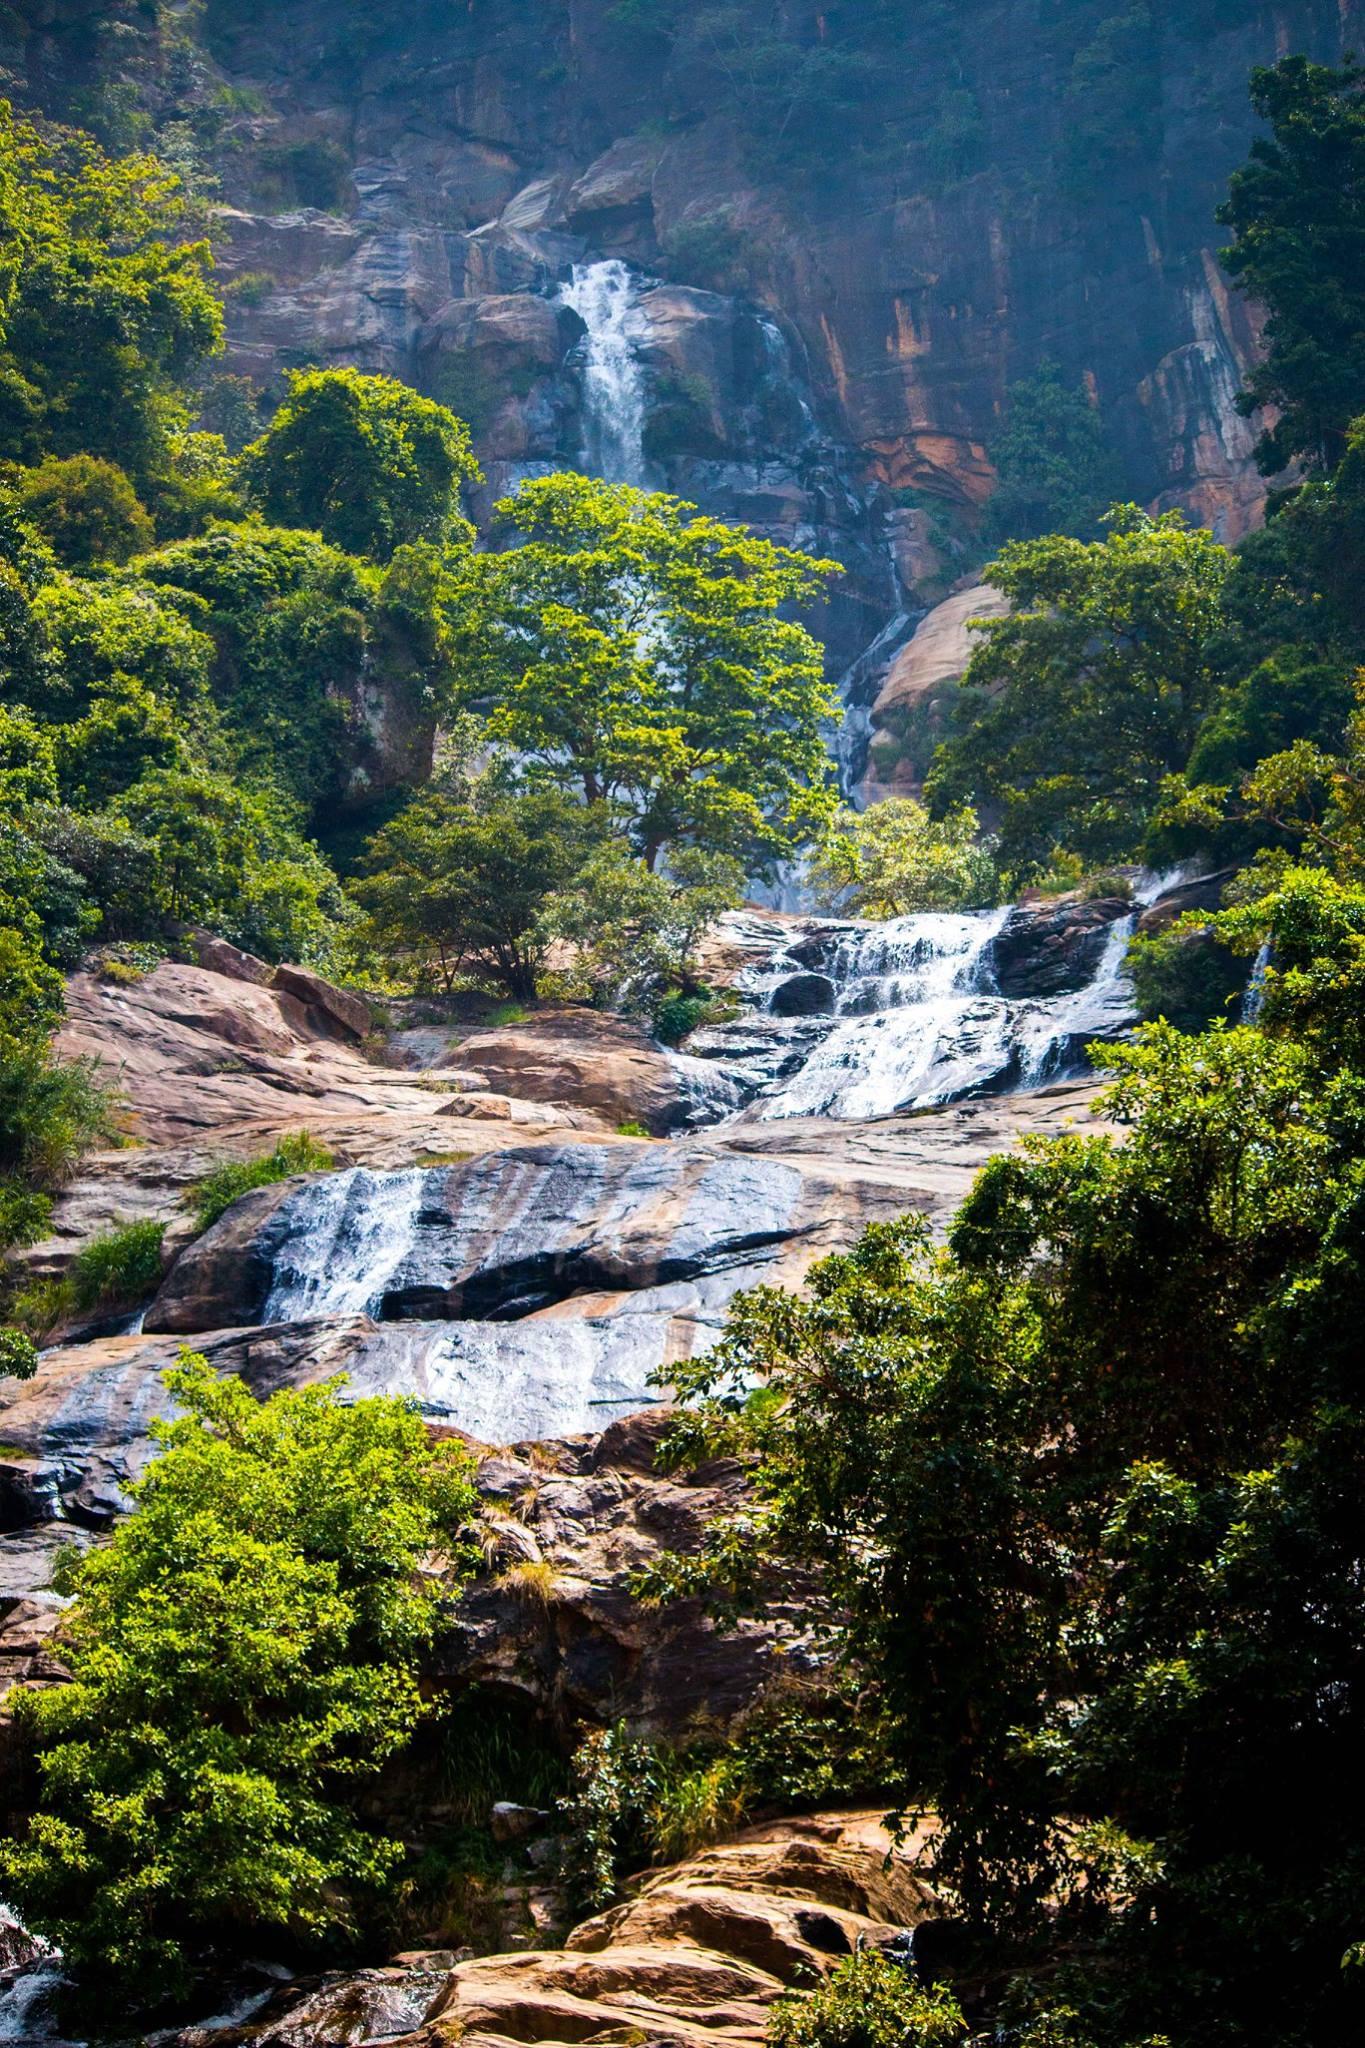 invite-to-paradise-sri-lanka-and-maldives-specialists-travel-agent-tour-operator-customer-review--feedback-joel-rhian-water-falls.jpg